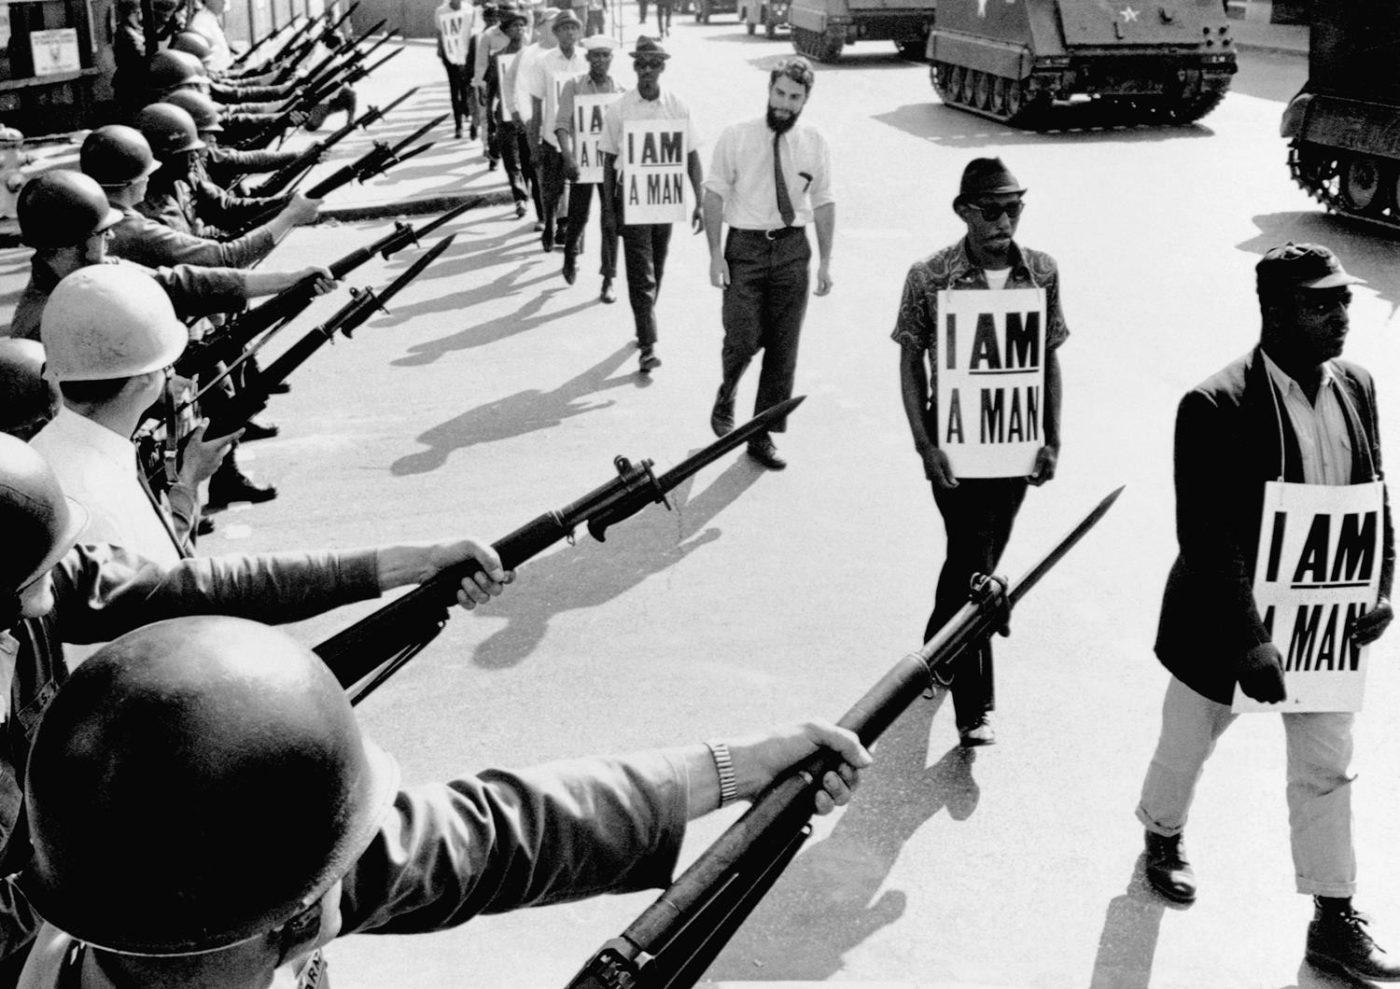 I-am-a-man-guns-tanks-Memphis-0368-by-Bettmann-CORBIS-1400x989, New Orleans sanitation 'hoppers' form union, strike for hazard pay, PPE, benefits, National News & Views